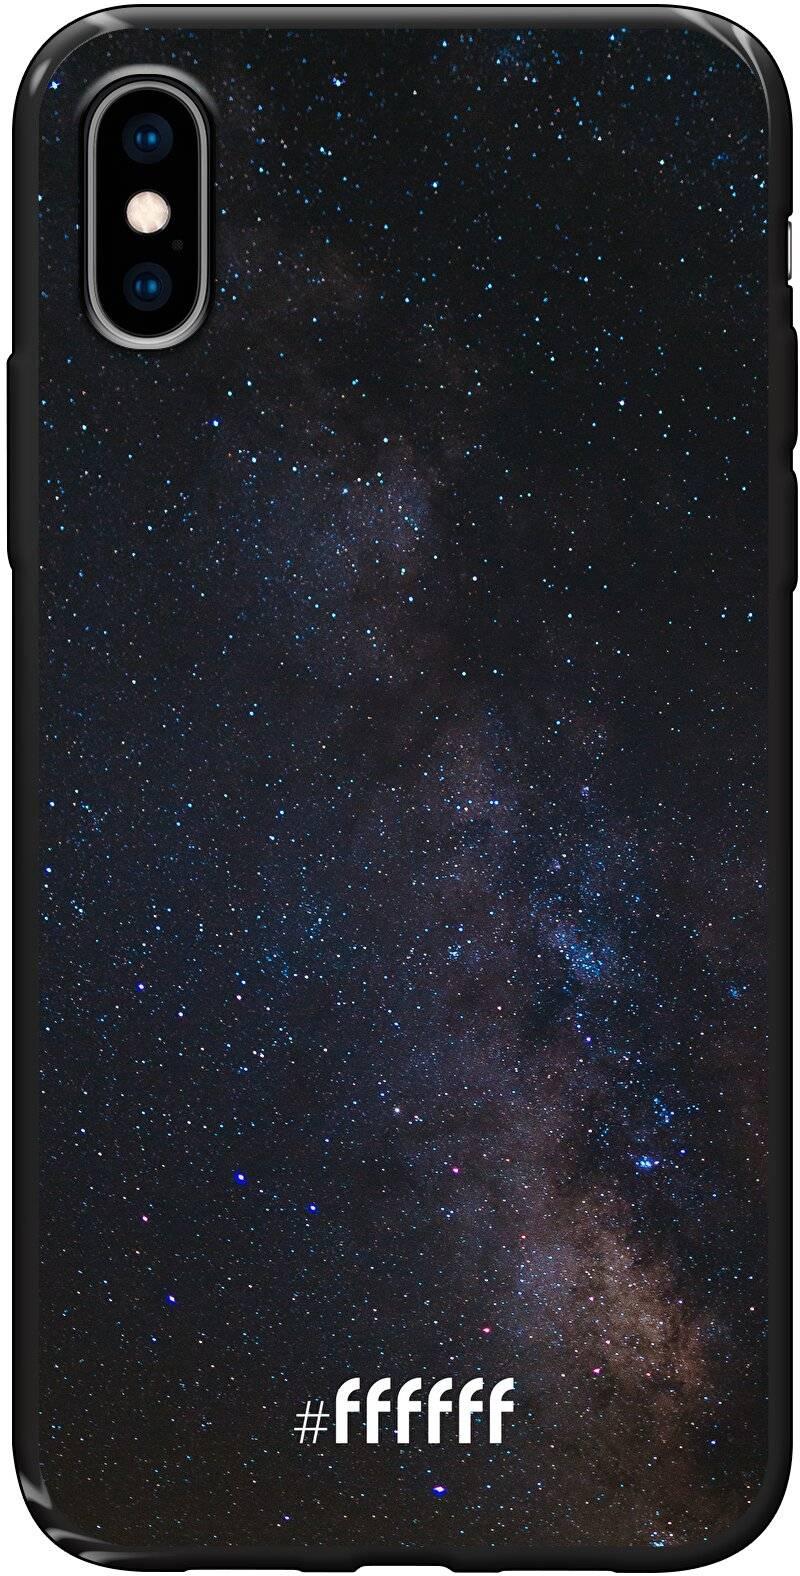 Dark Space iPhone X